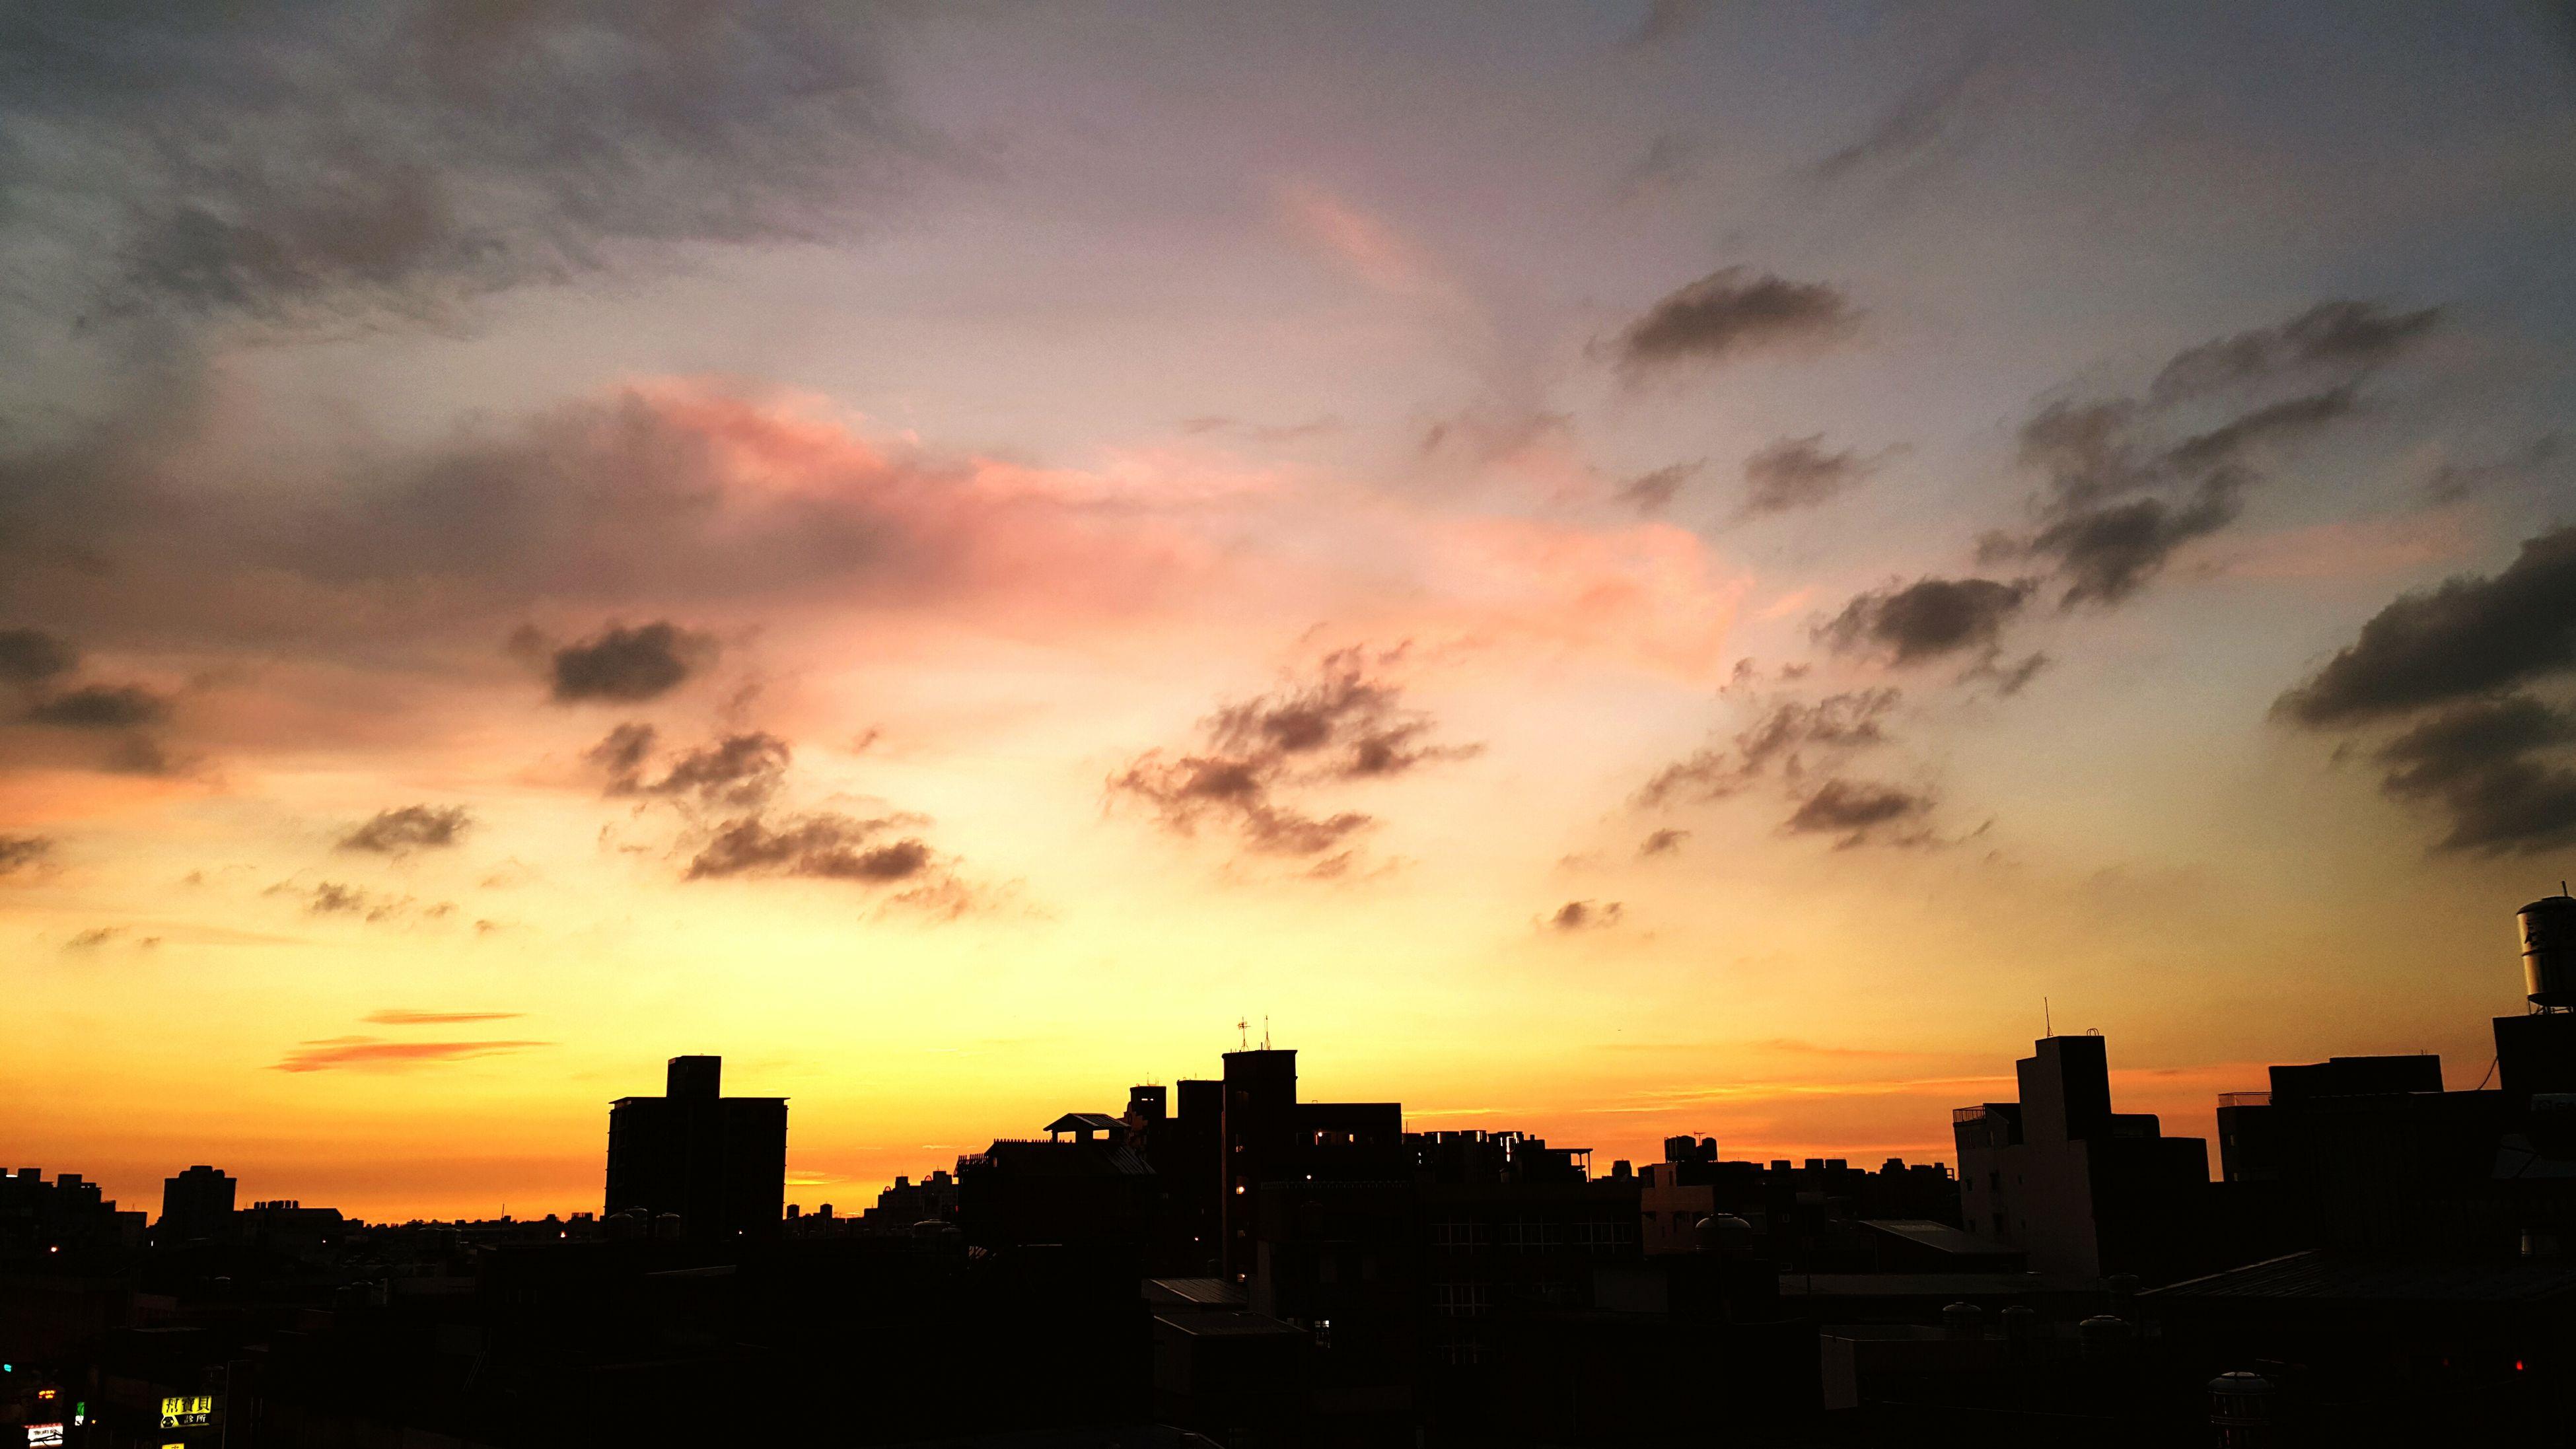 sunset, silhouette, building exterior, architecture, built structure, orange color, sky, city, cloud - sky, dramatic sky, cityscape, dark, beauty in nature, scenics, nature, outdoors, cloud, outline, dusk, no people